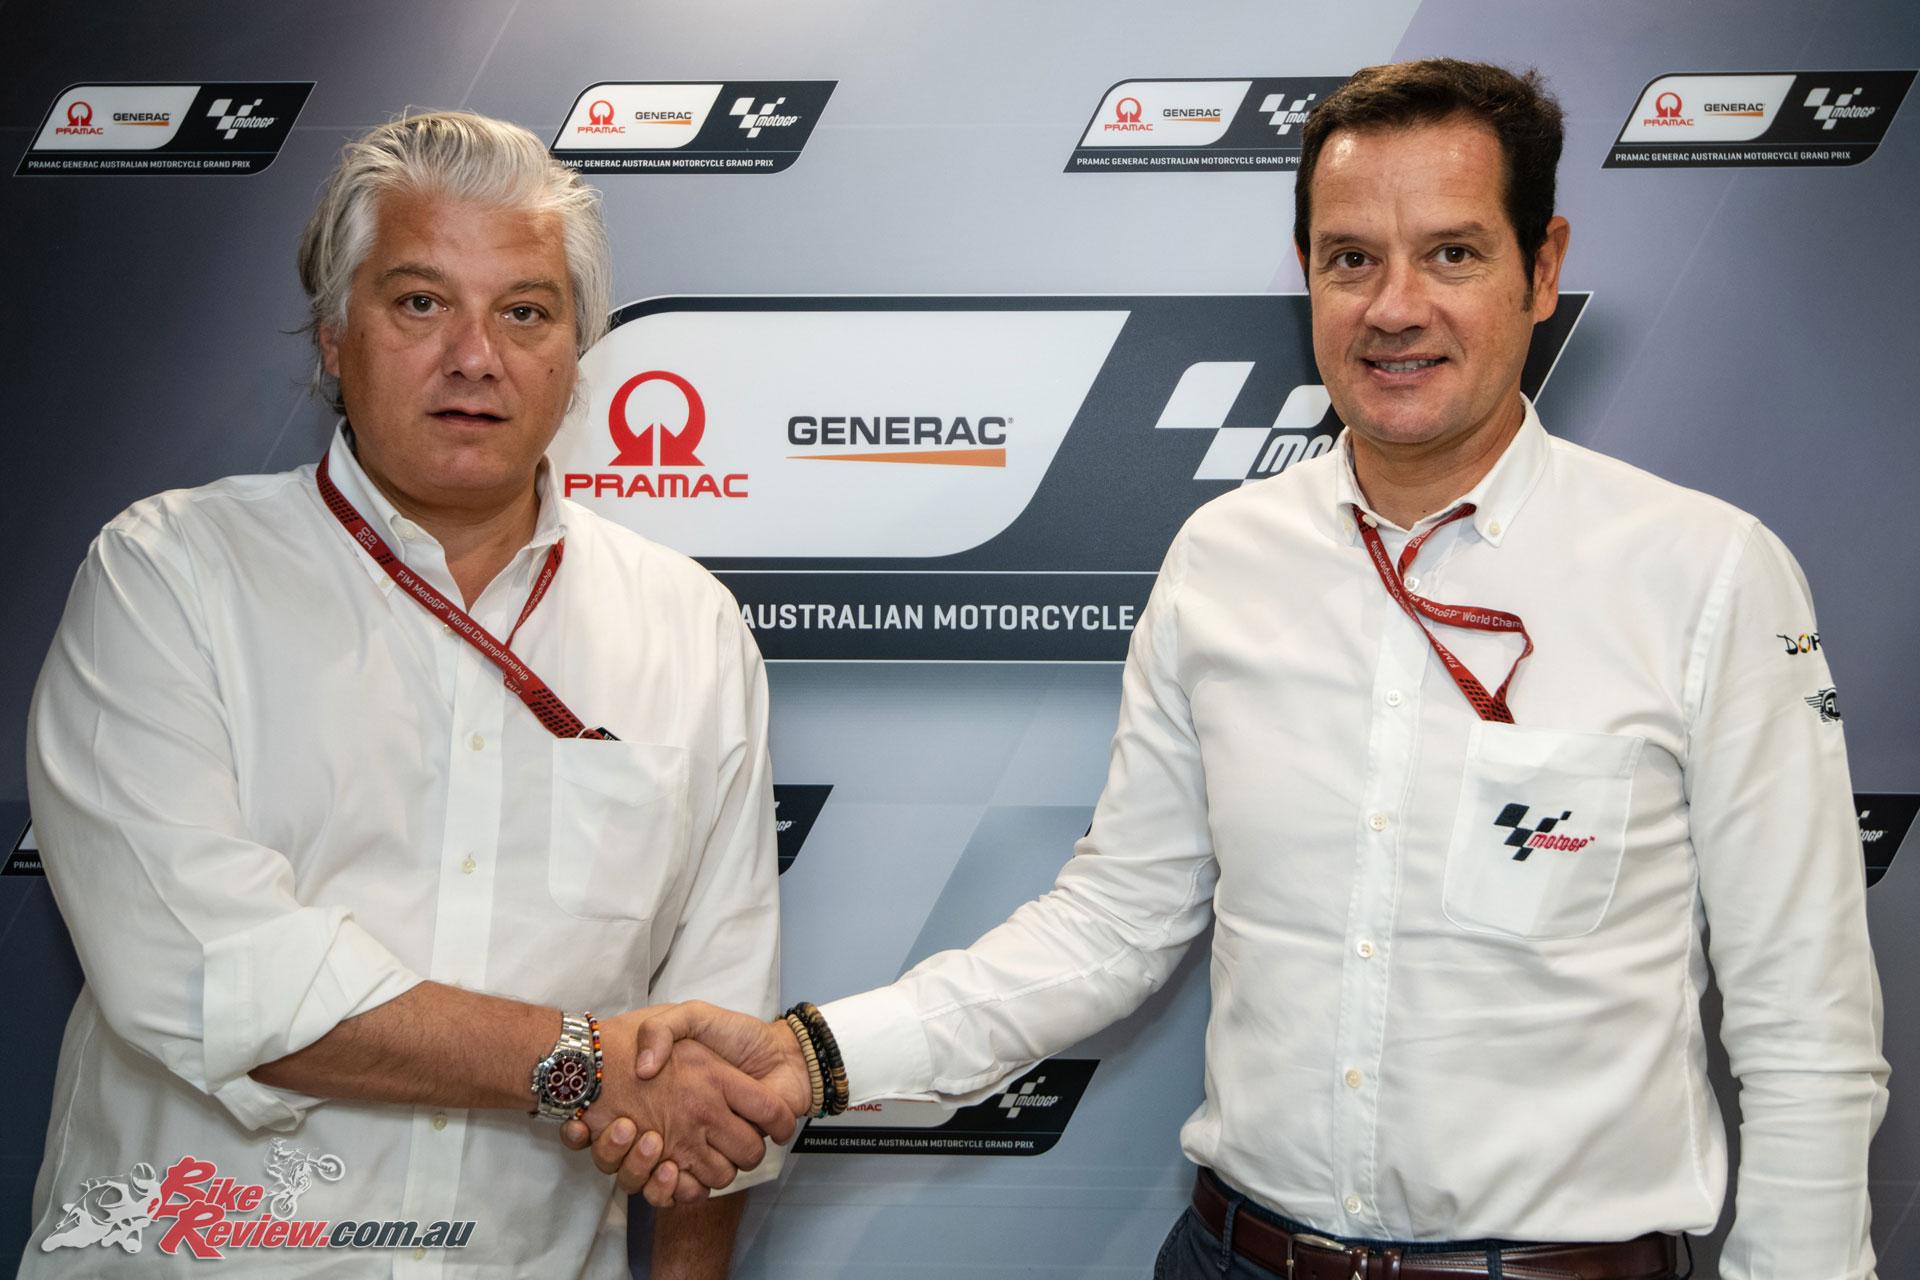 Paolo Campinoti, Pramac CEO, Generac Executive Vice President Row (L) and Pau Serracanta, Managing Director at Dorna Sports